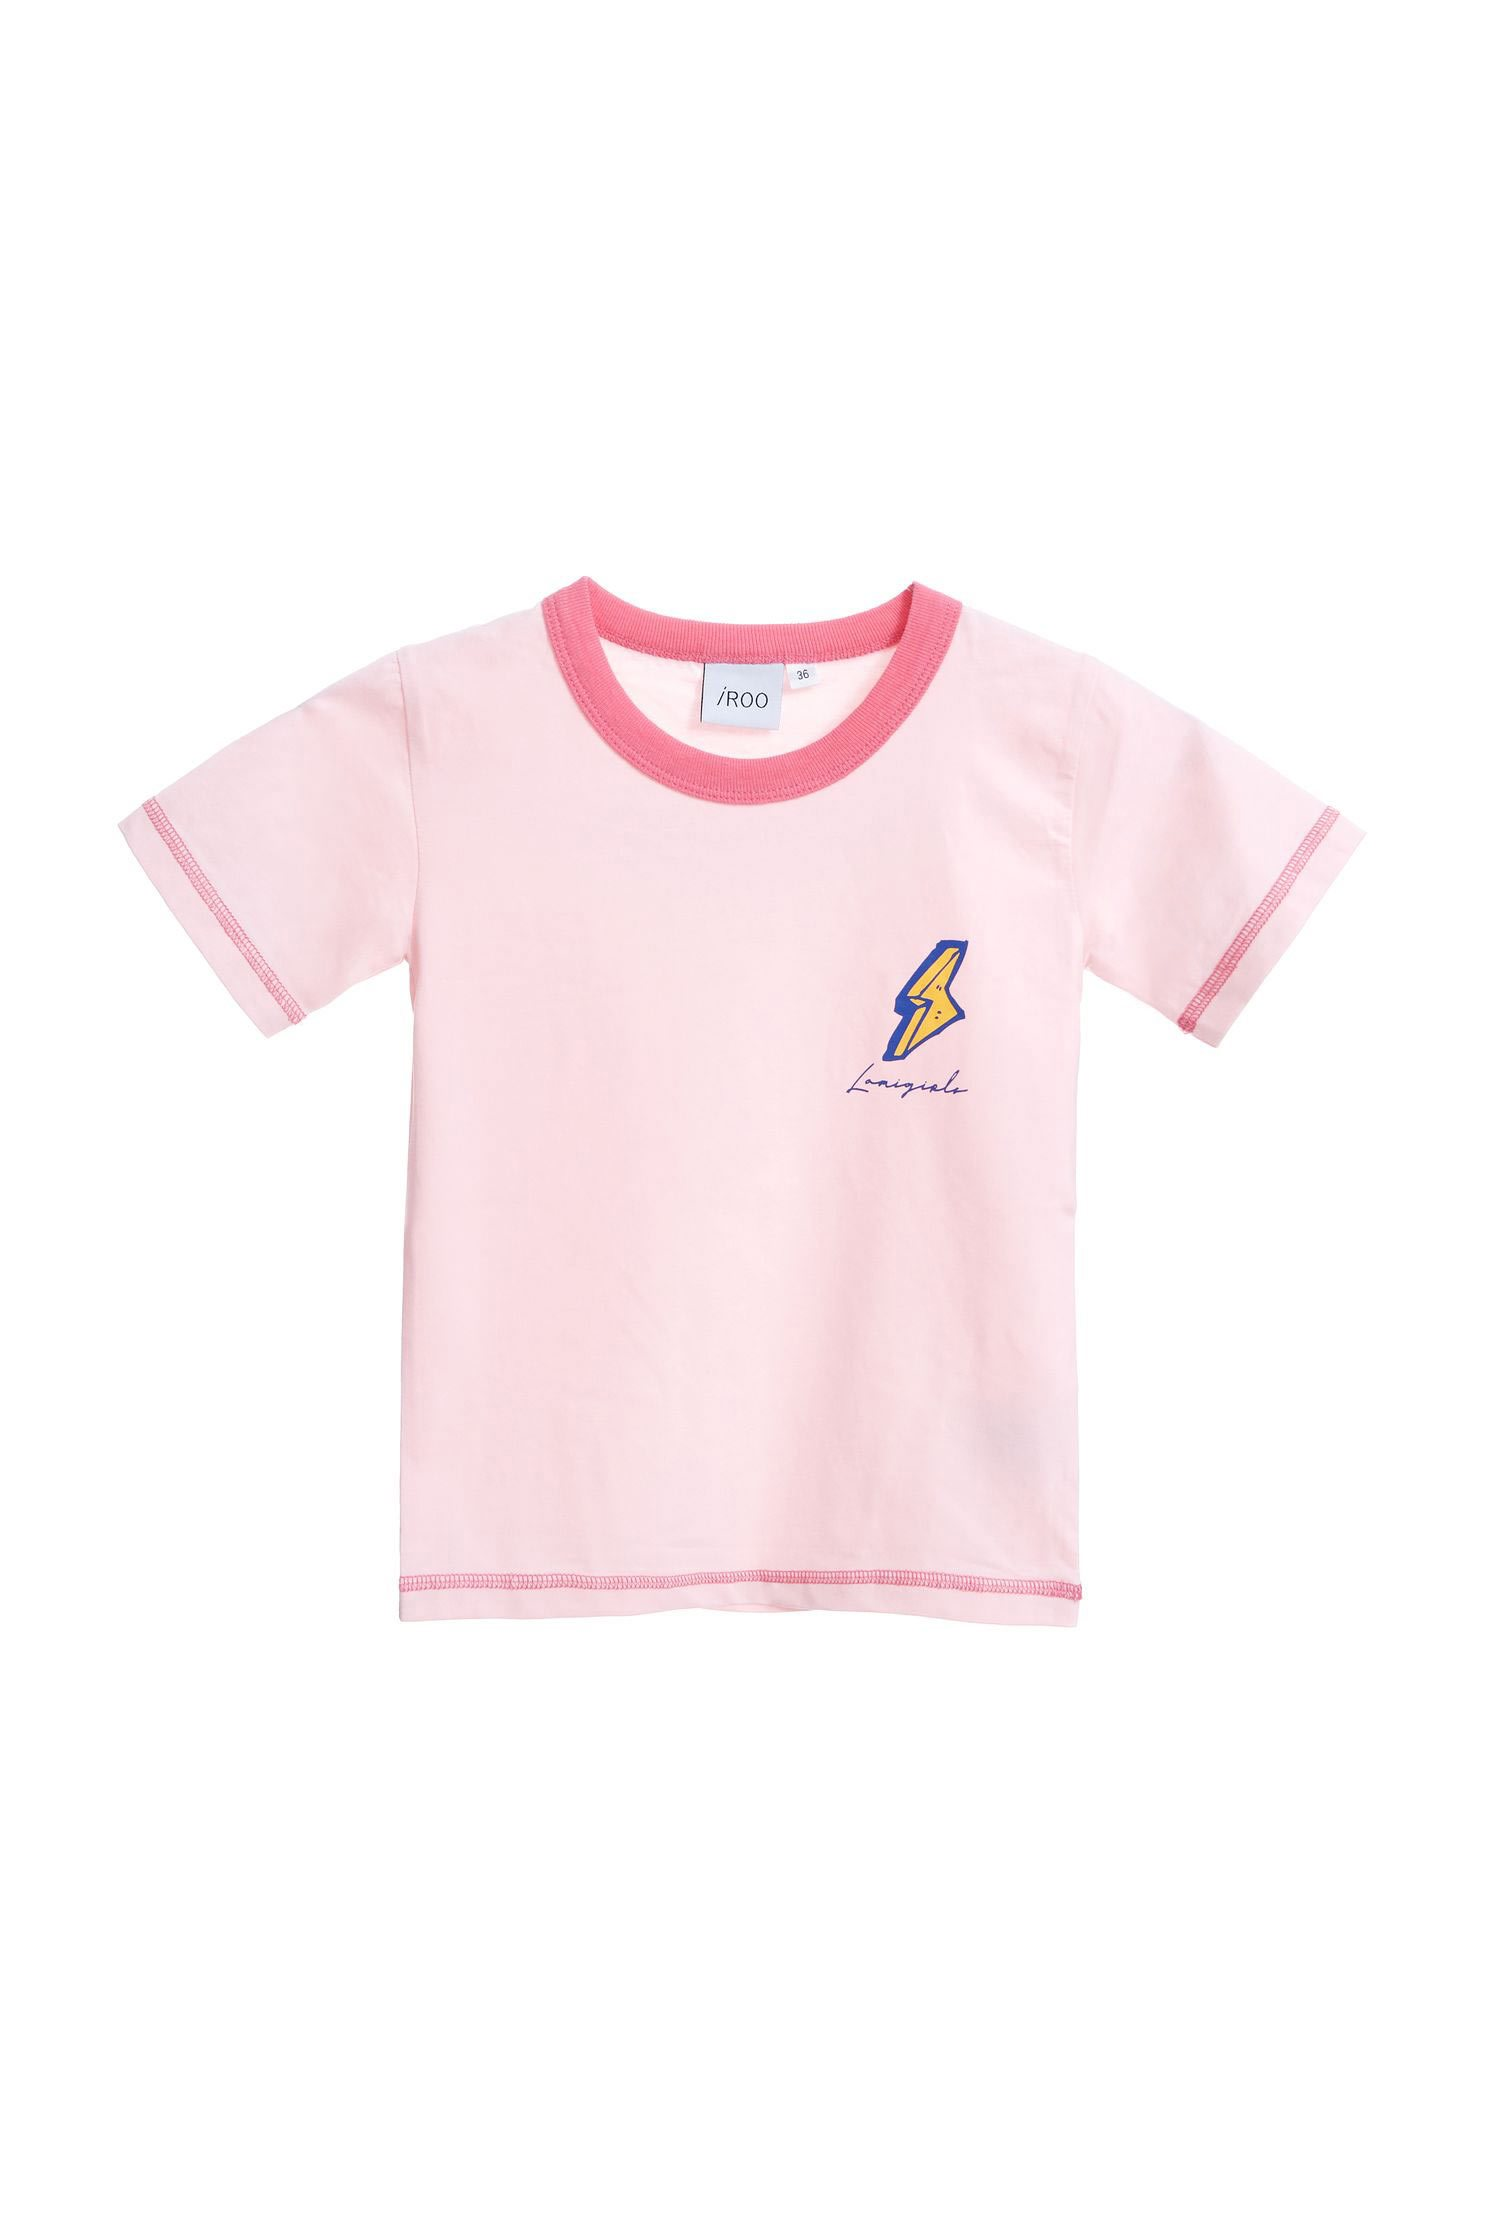 iRoo x LamiGirlsEmbroidery Pop Cotton Short Sleeve Tshirt-kids